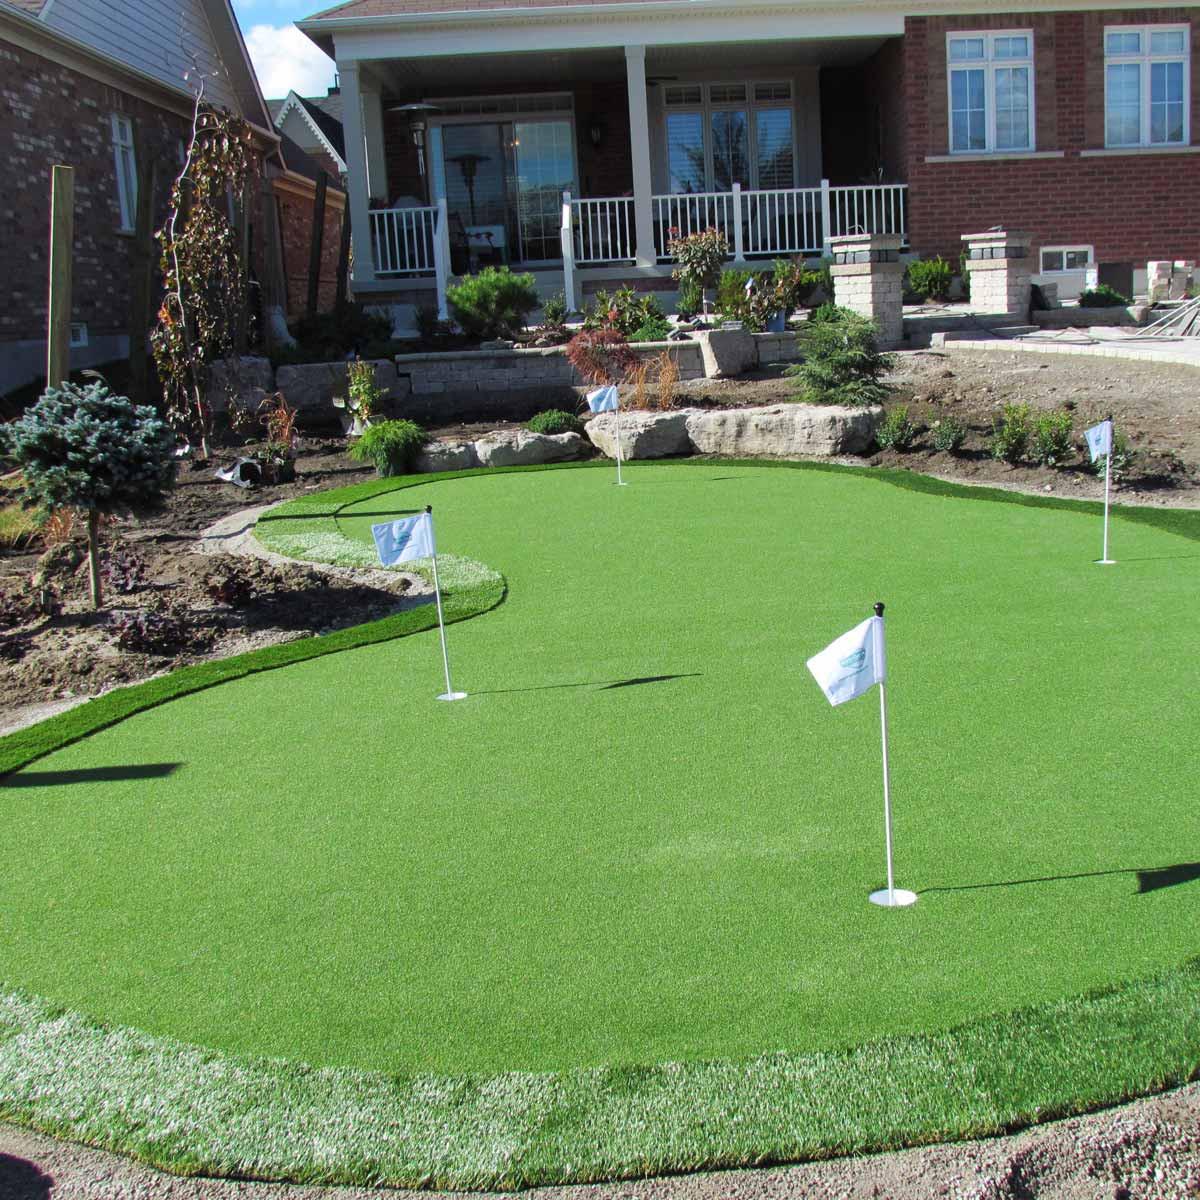 Backyard Putting Green DIY  19 Crazy Cool Backyard Putting Greens — The Family Handyman